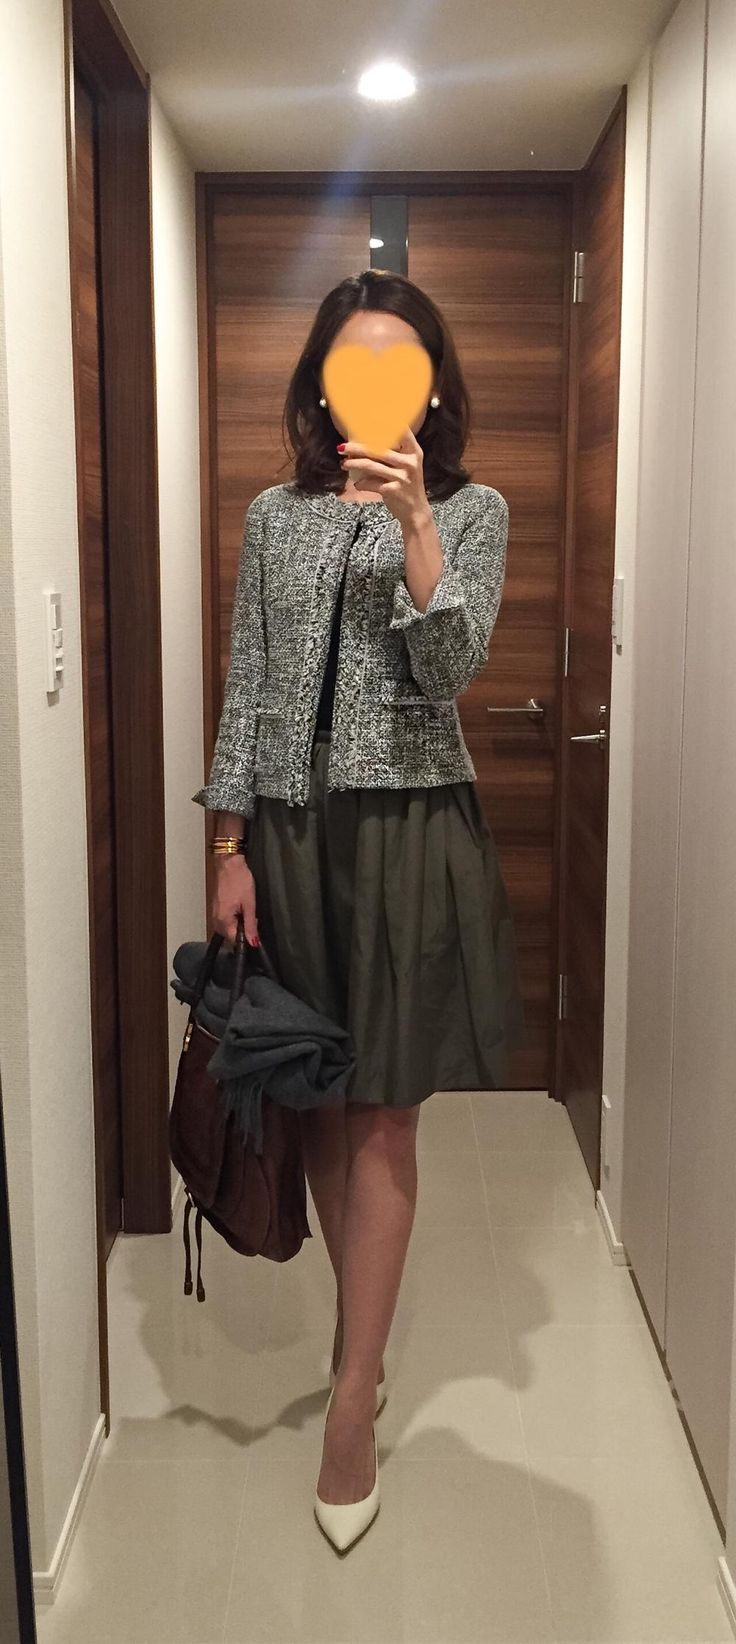 Jacket: NEWYORKER, Tee: Uniqlo, Khaki skirt: Nolley's, Bag: Chloe, White pumps: Jimmy Choo